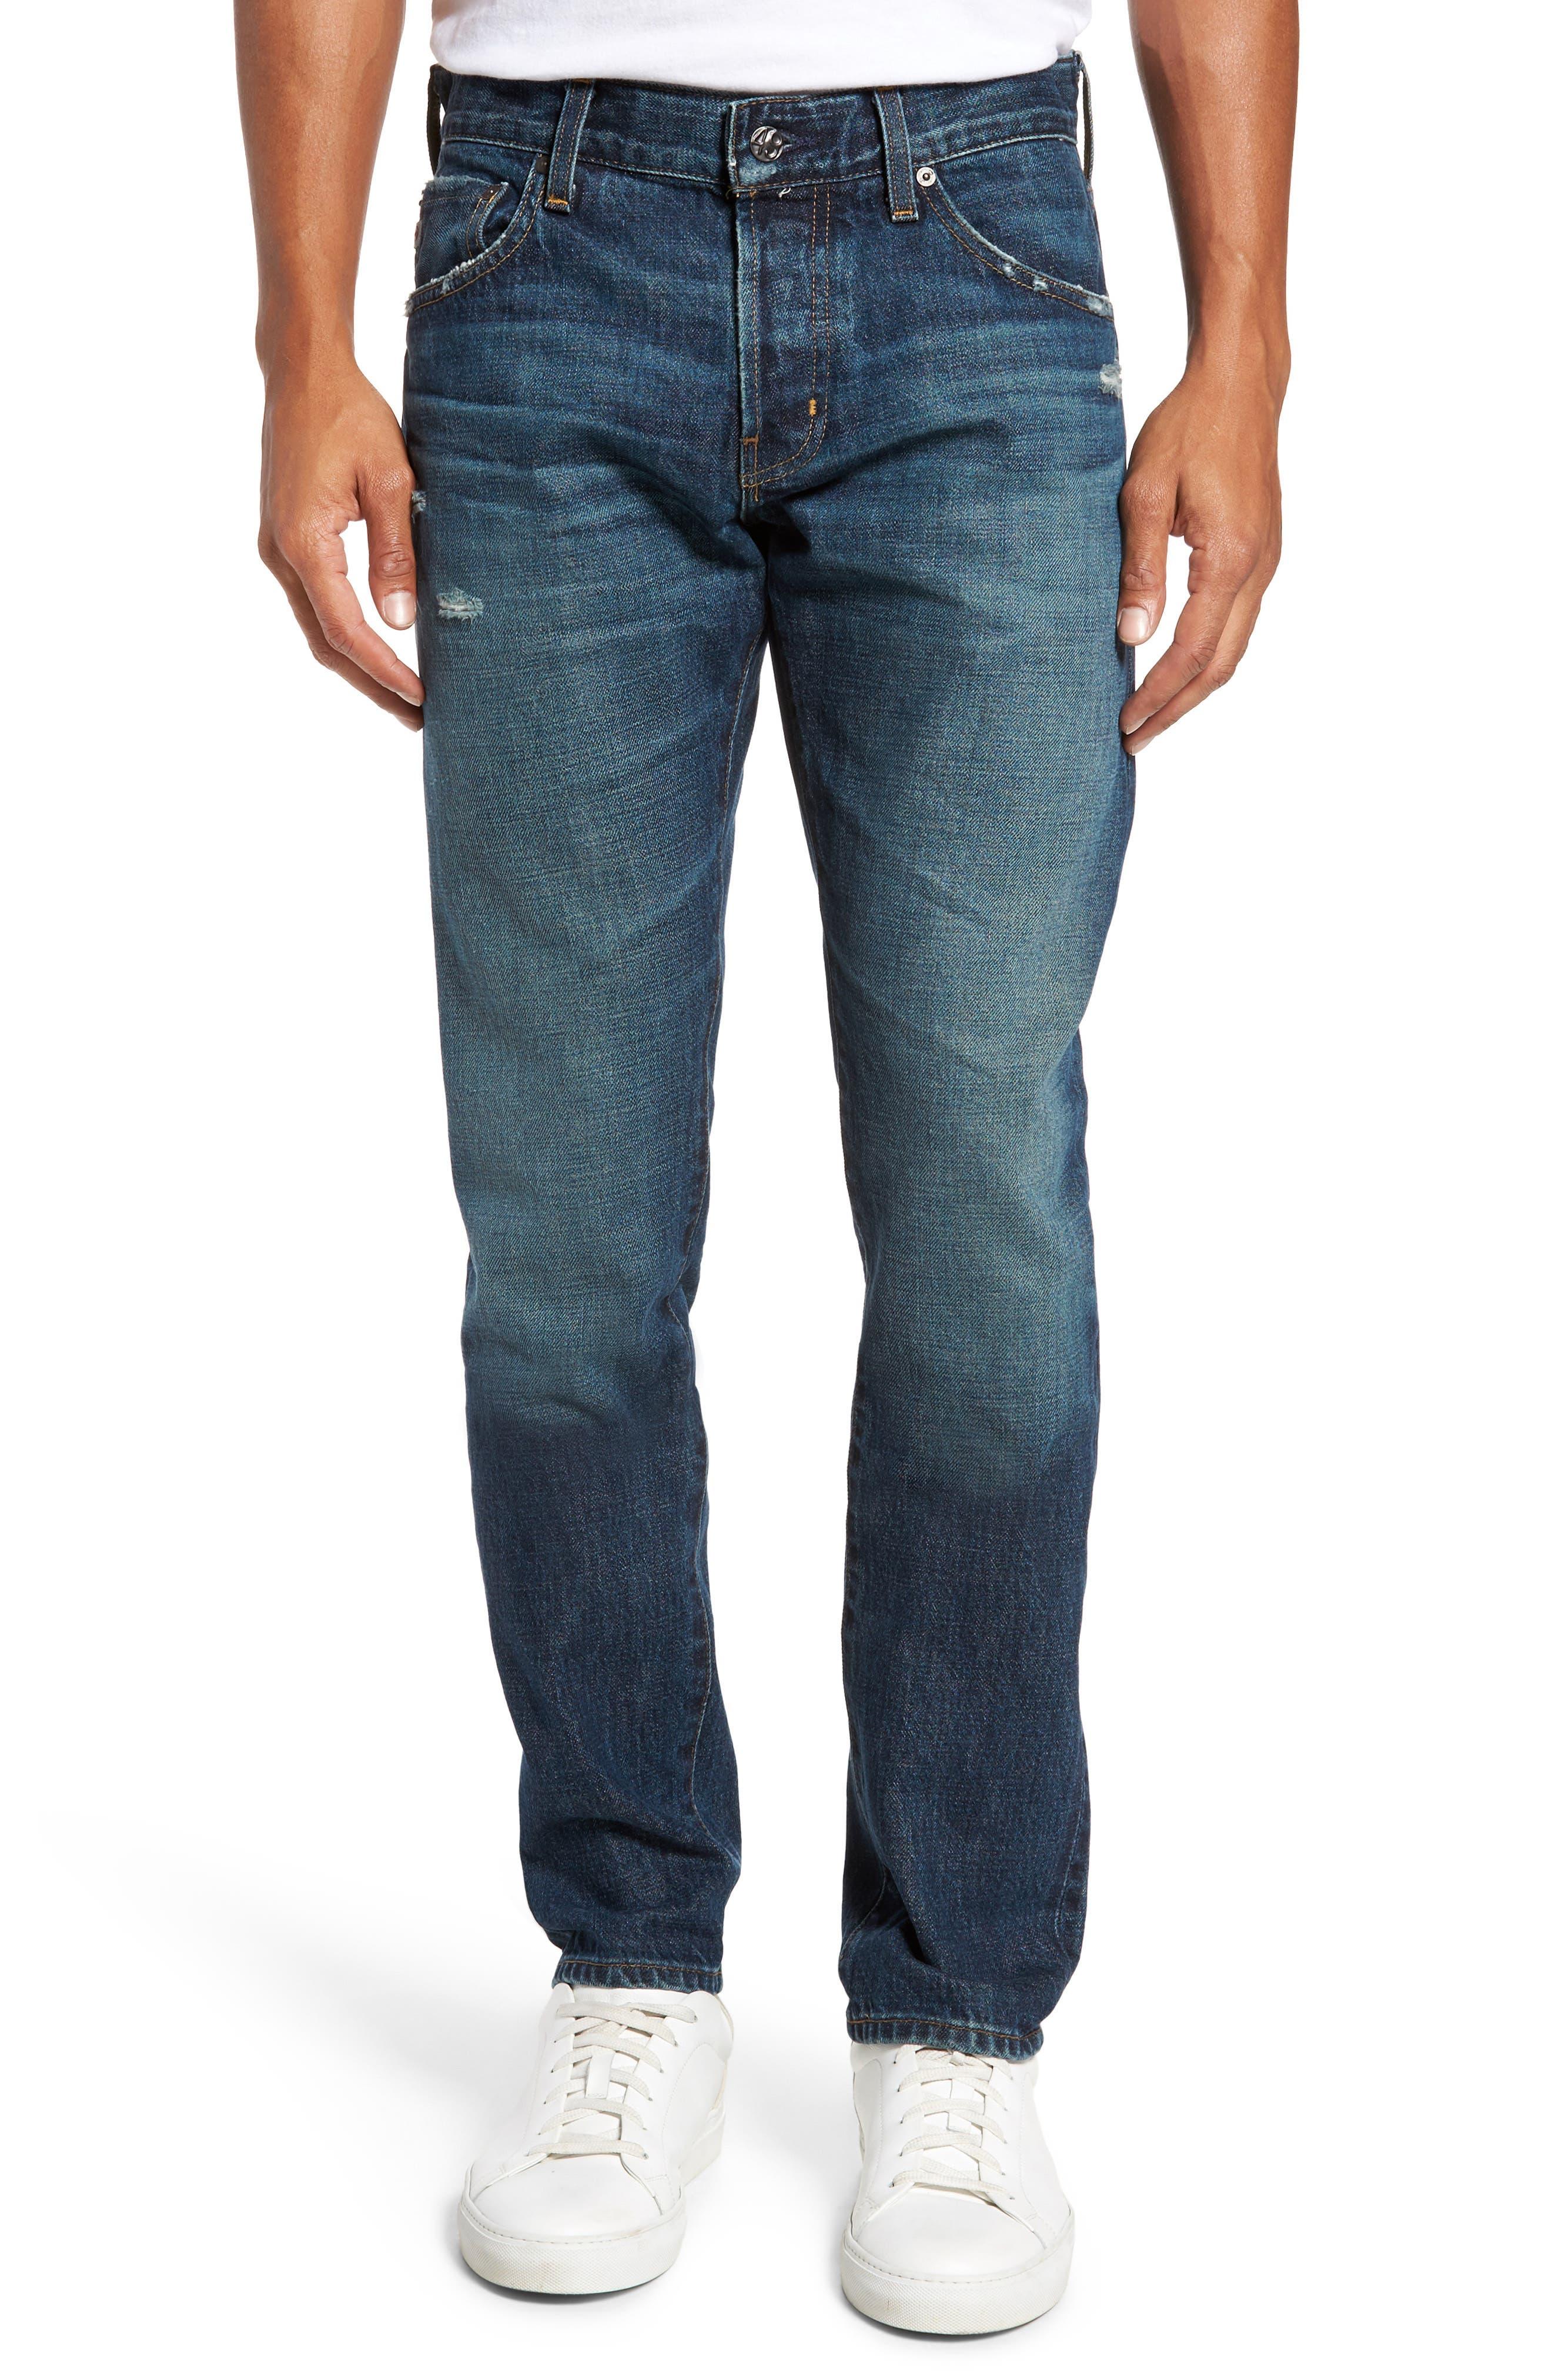 Tellis Slim Fit Jeans,                         Main,                         color, 11 Years Viper